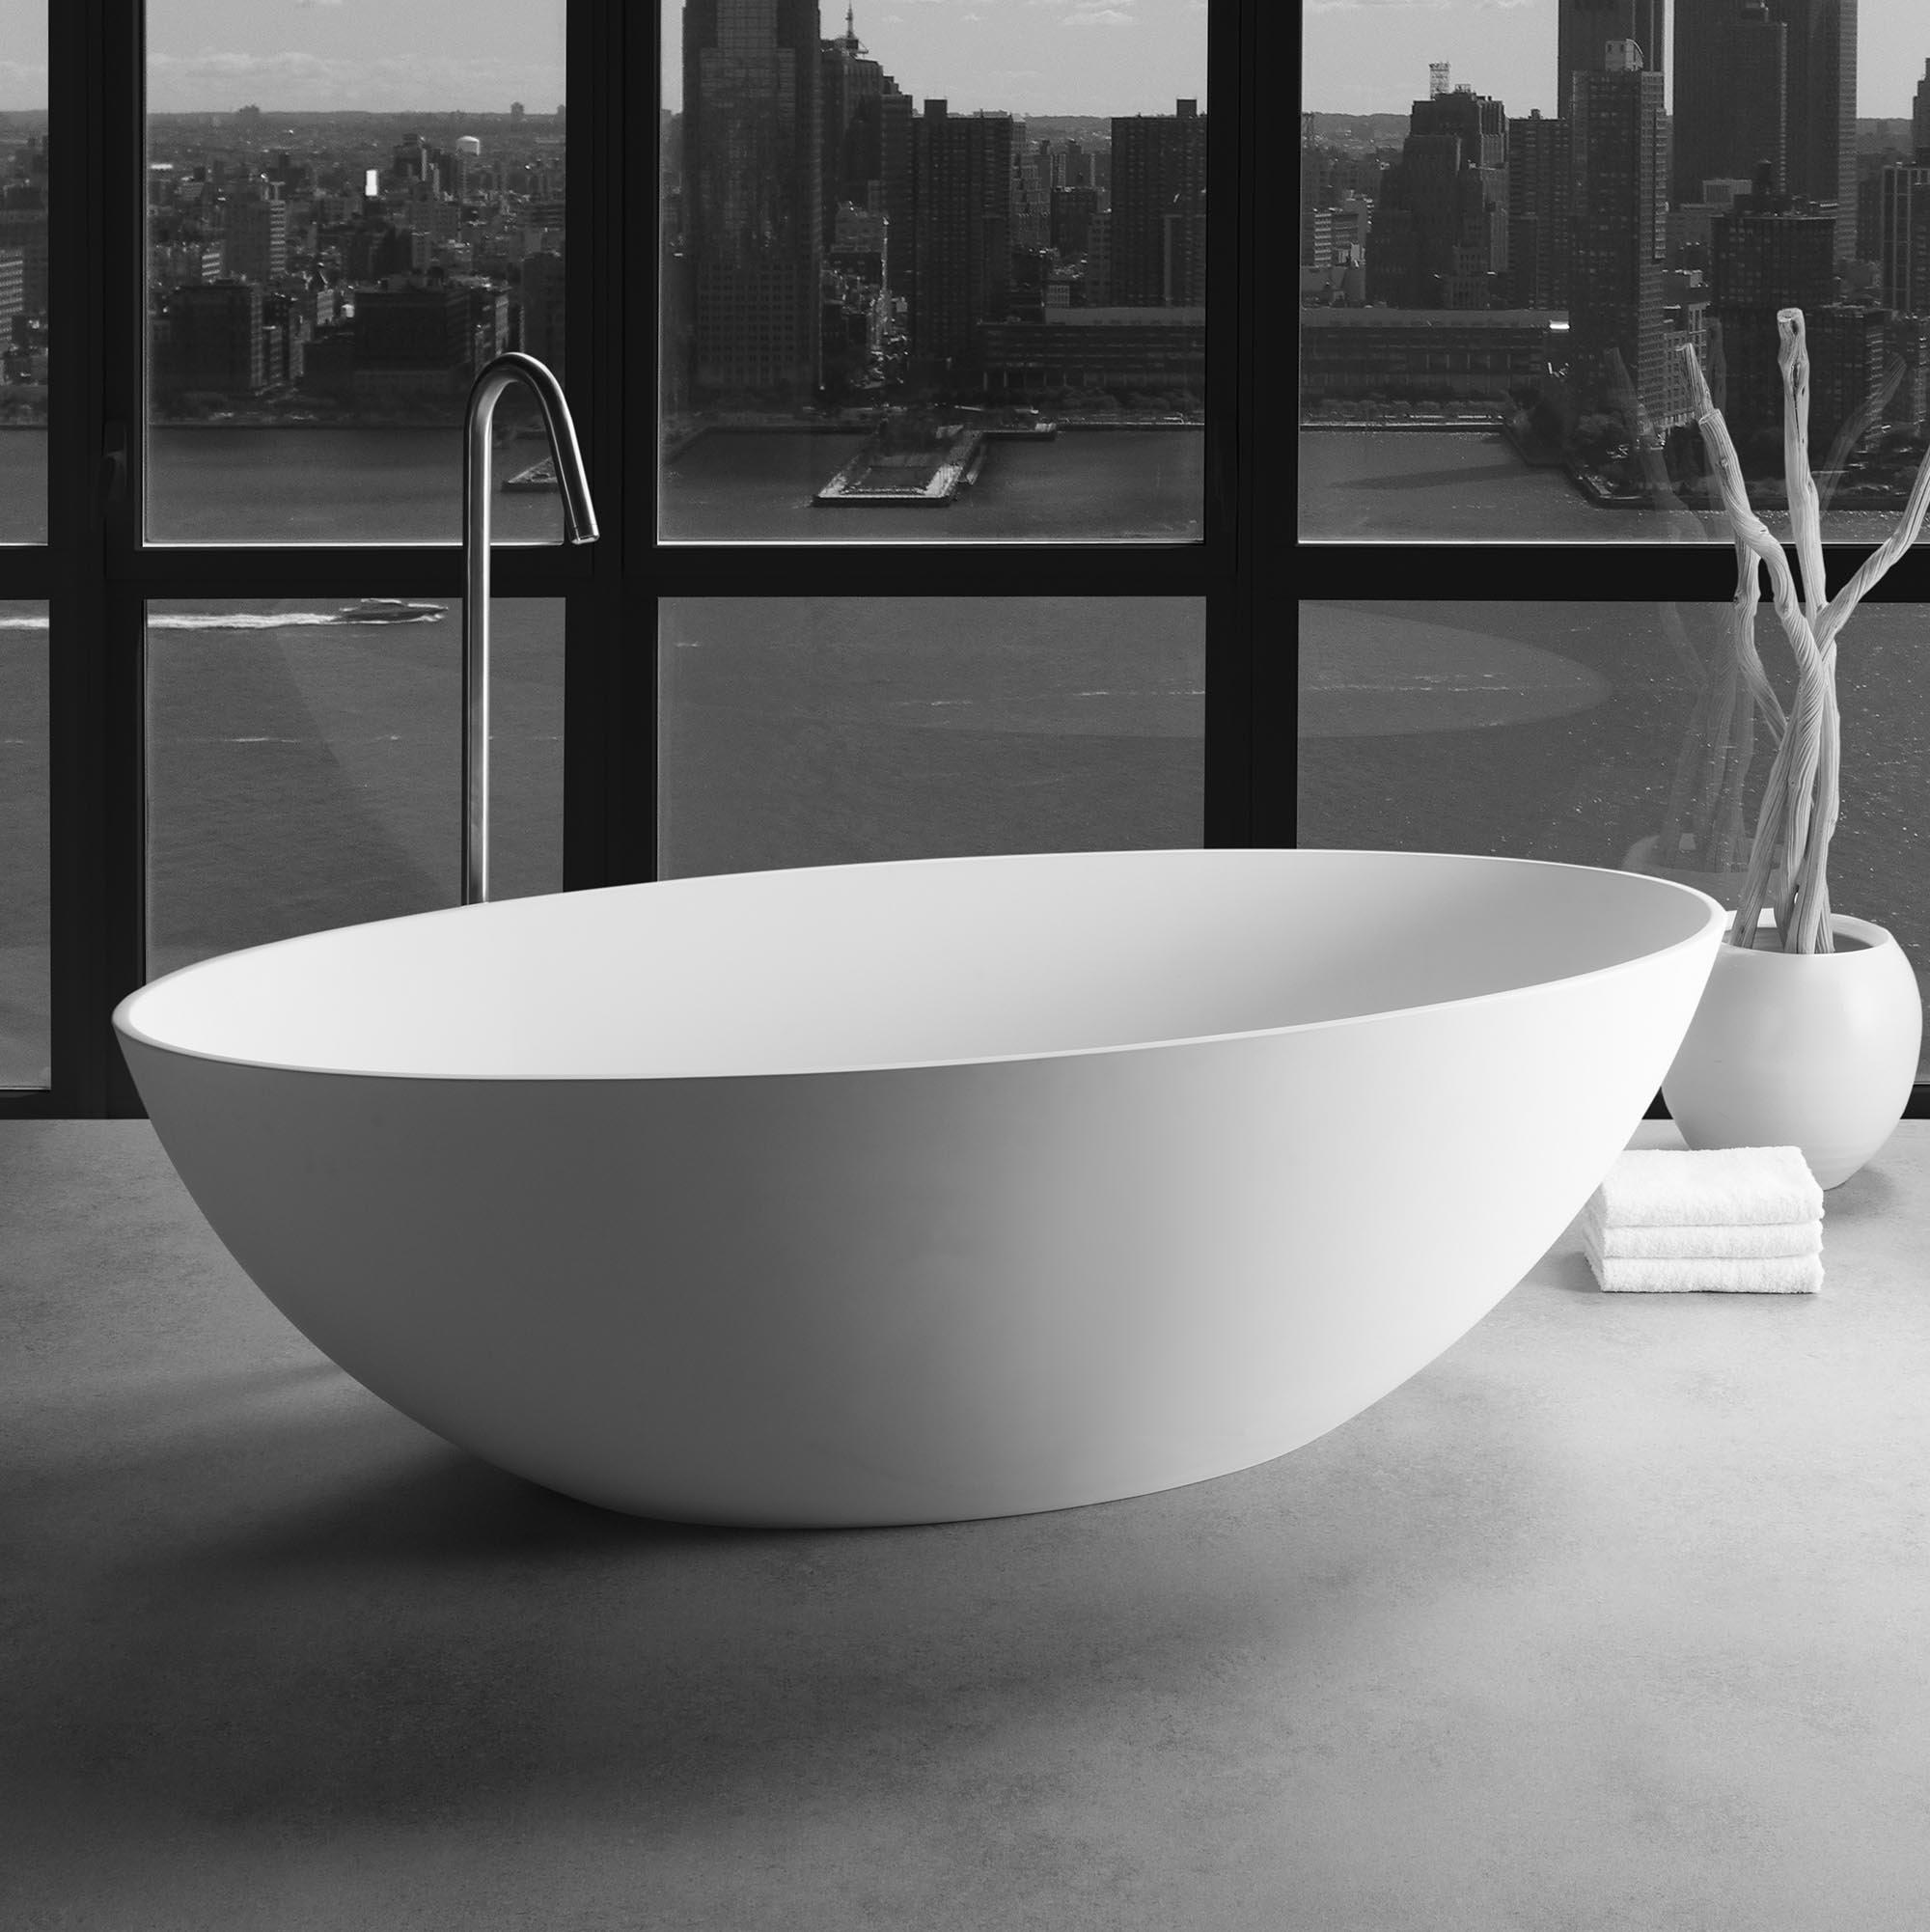 baignoire originale baignoire moderne baignoir moderne. Black Bedroom Furniture Sets. Home Design Ideas